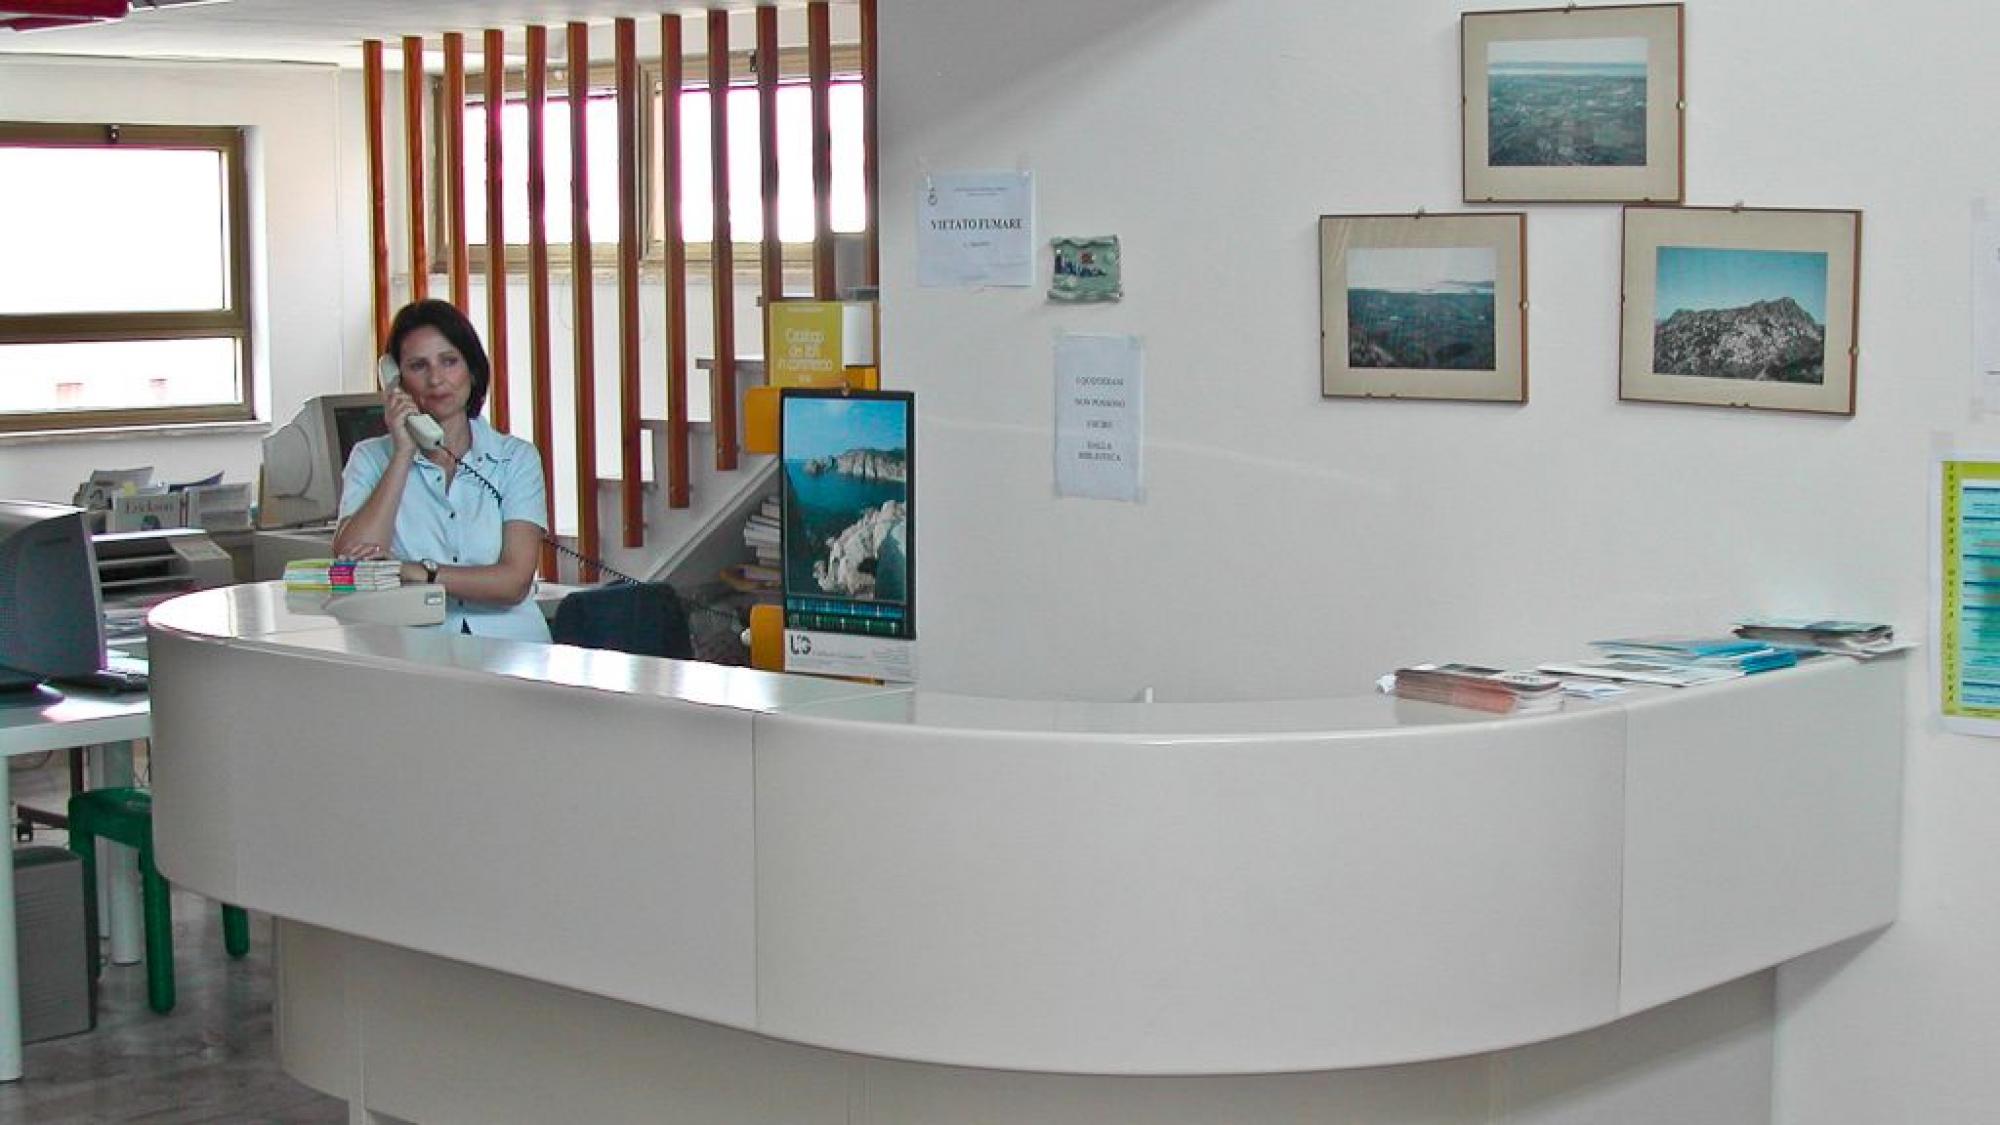 san giovanni suergiu - biblioteca comunale